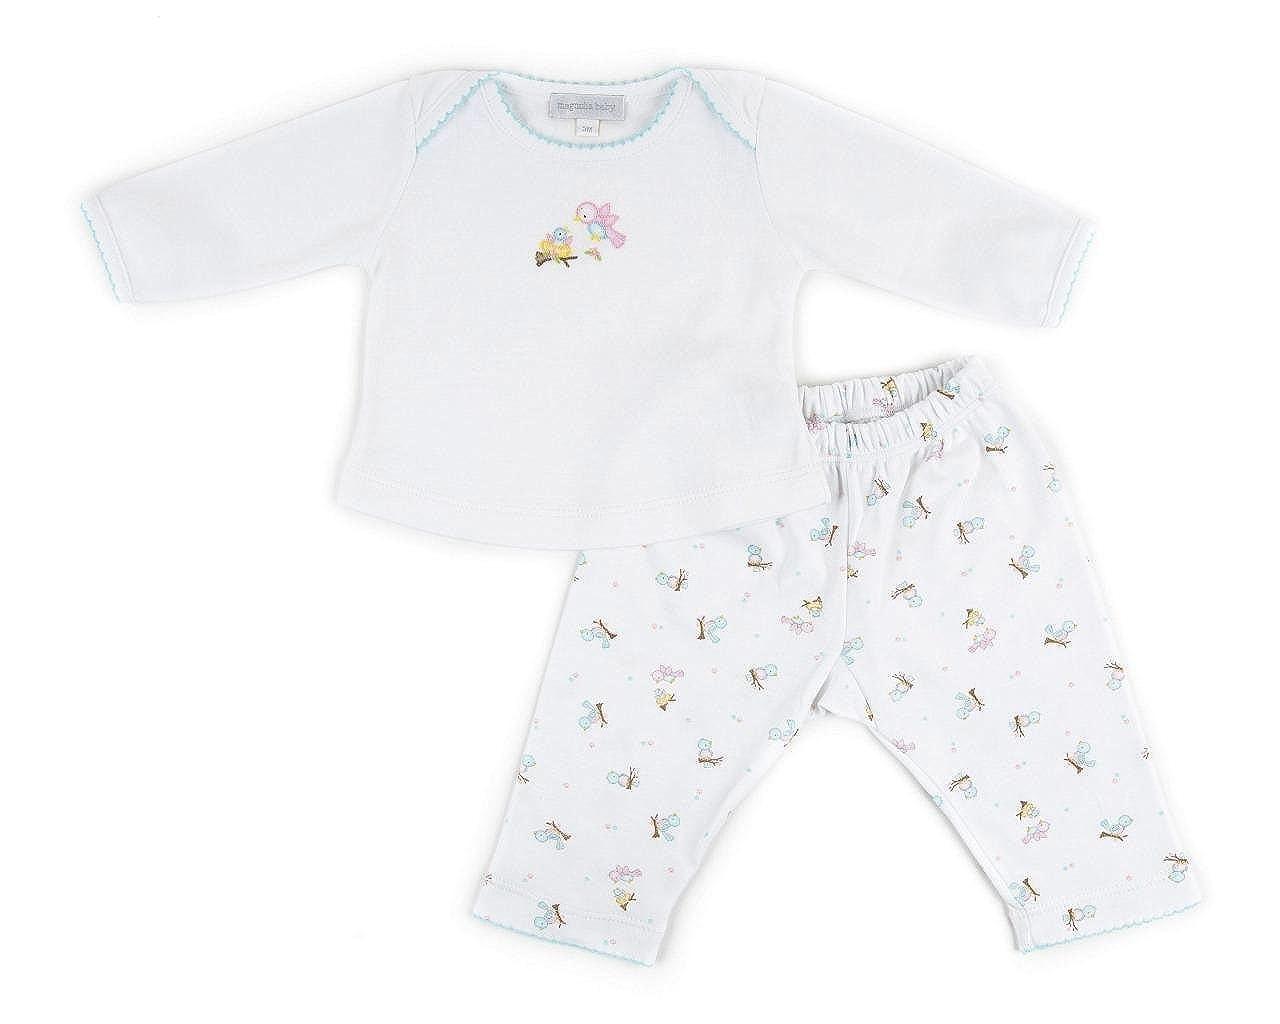 Magnolia Baby PANTS ベビーガールズ 9 Months  B00XLRGM7E